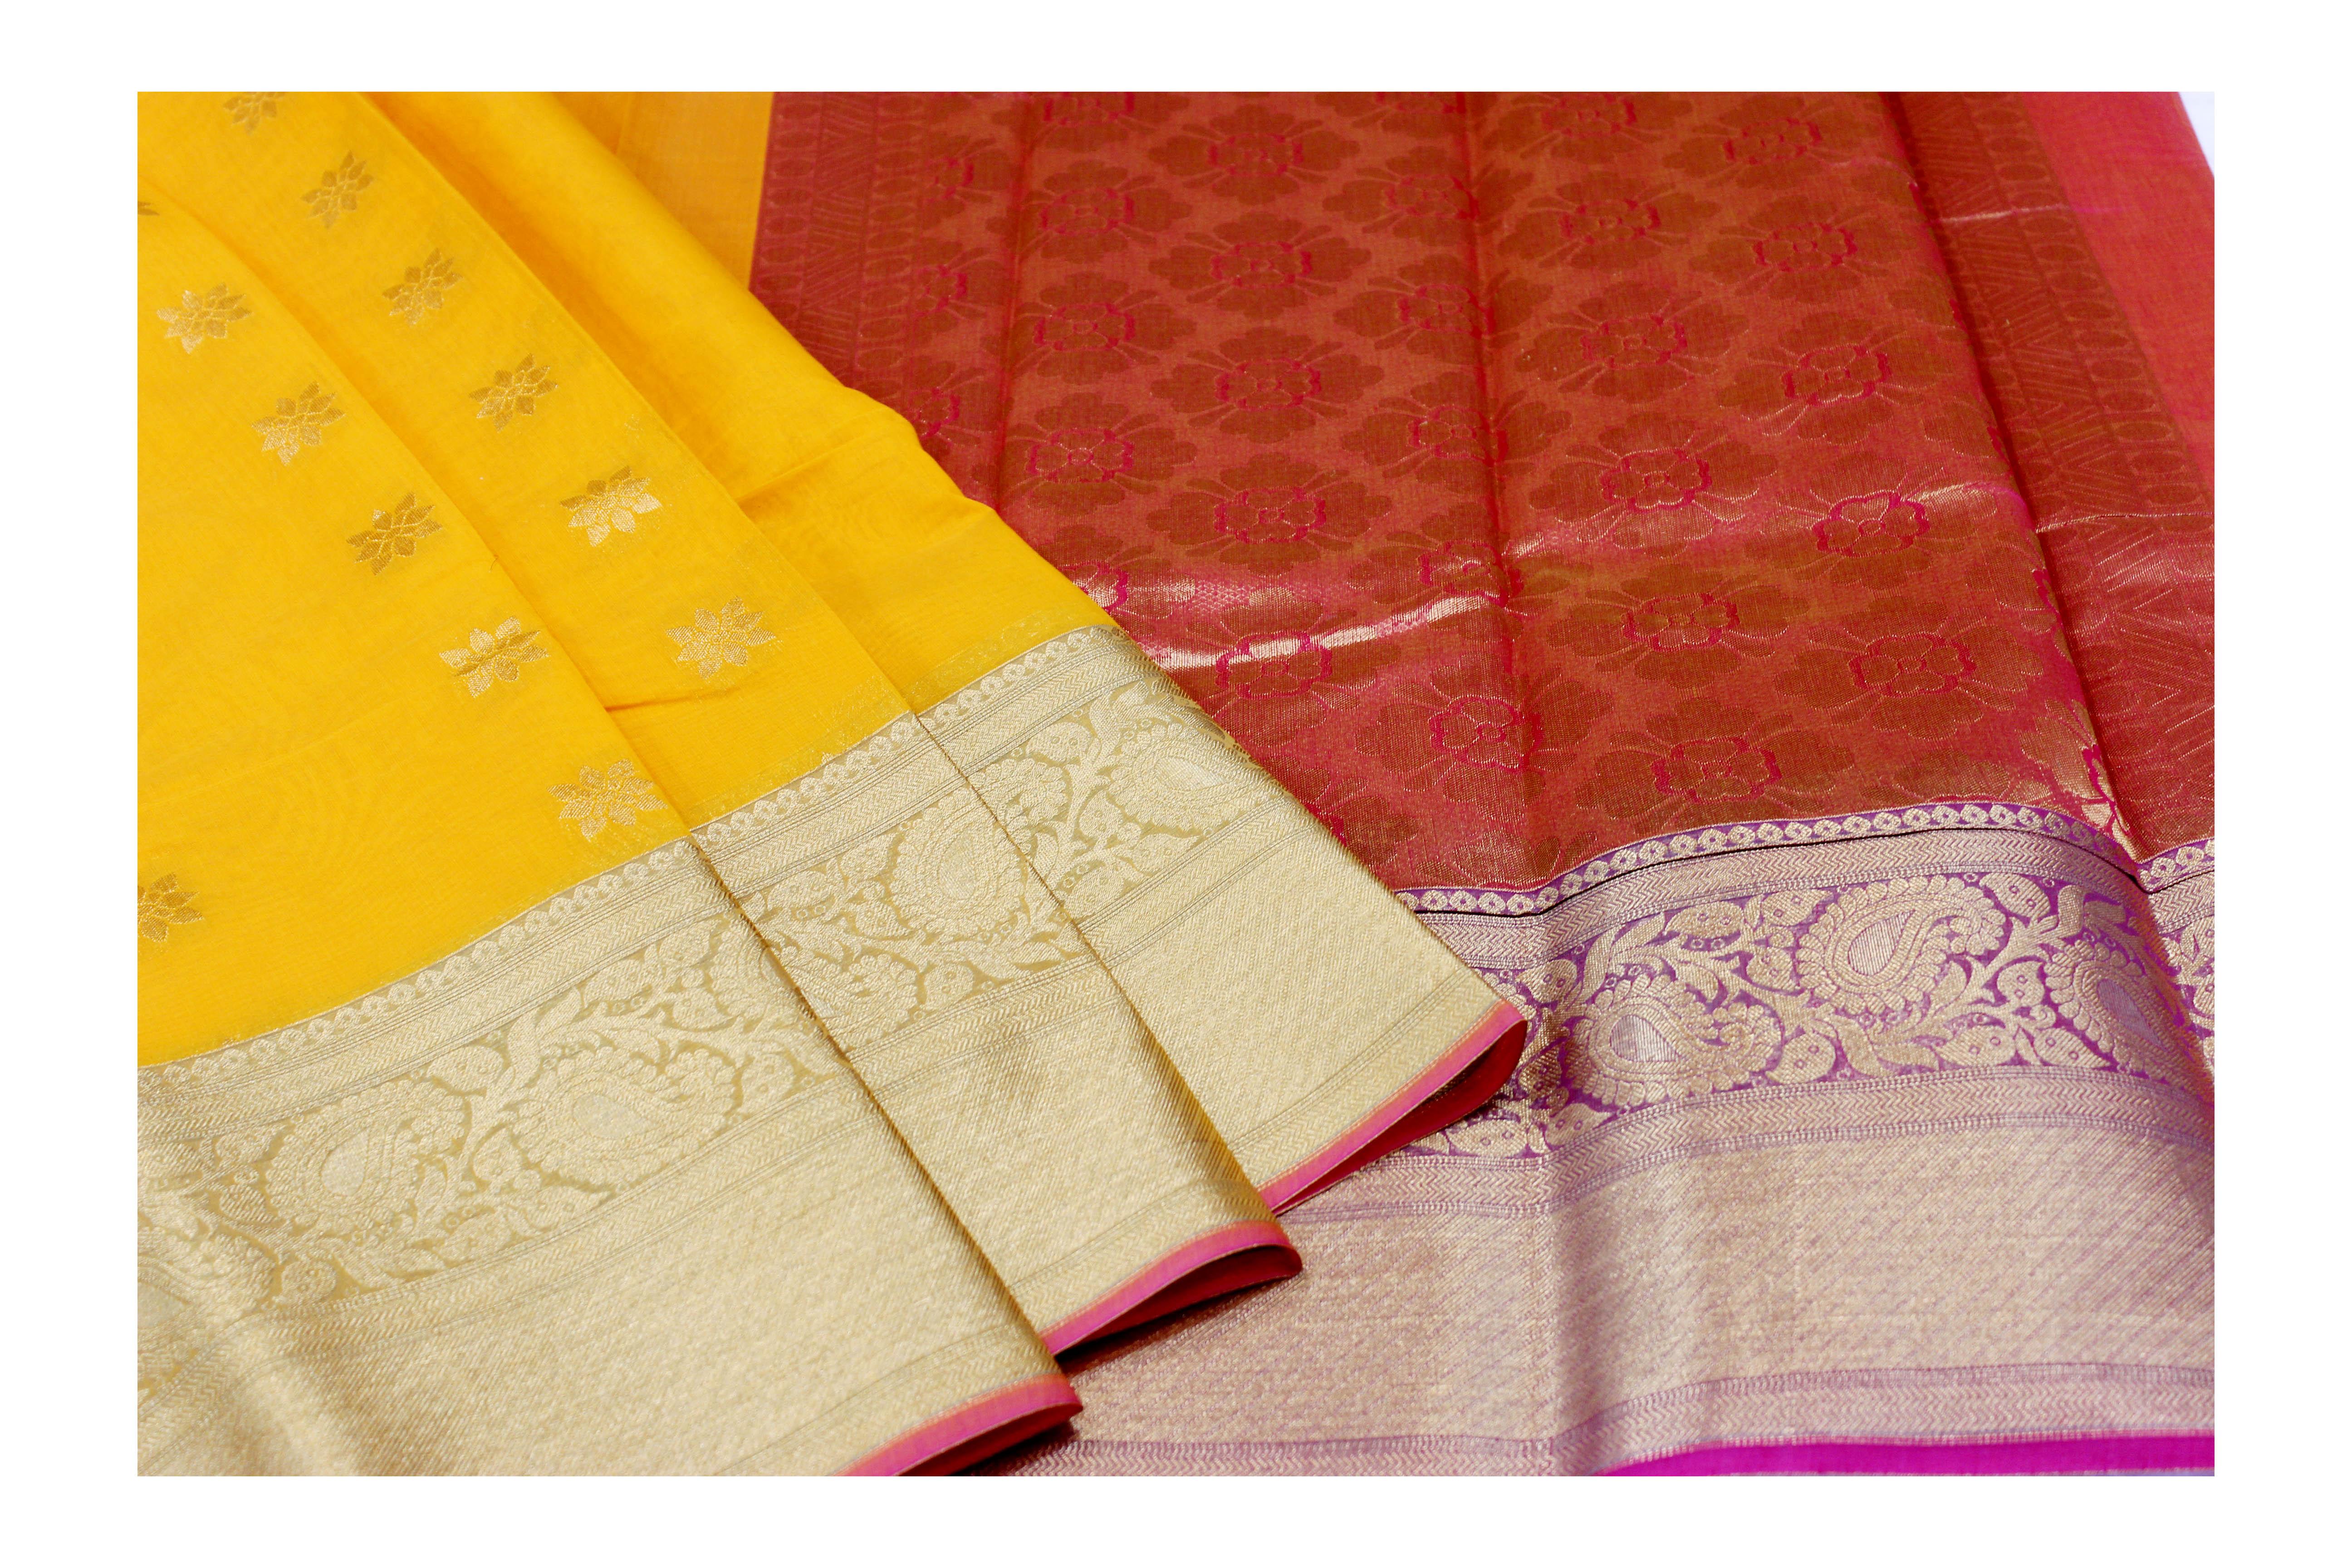 Mixture of yellow and maroon kanchi cotton saree.